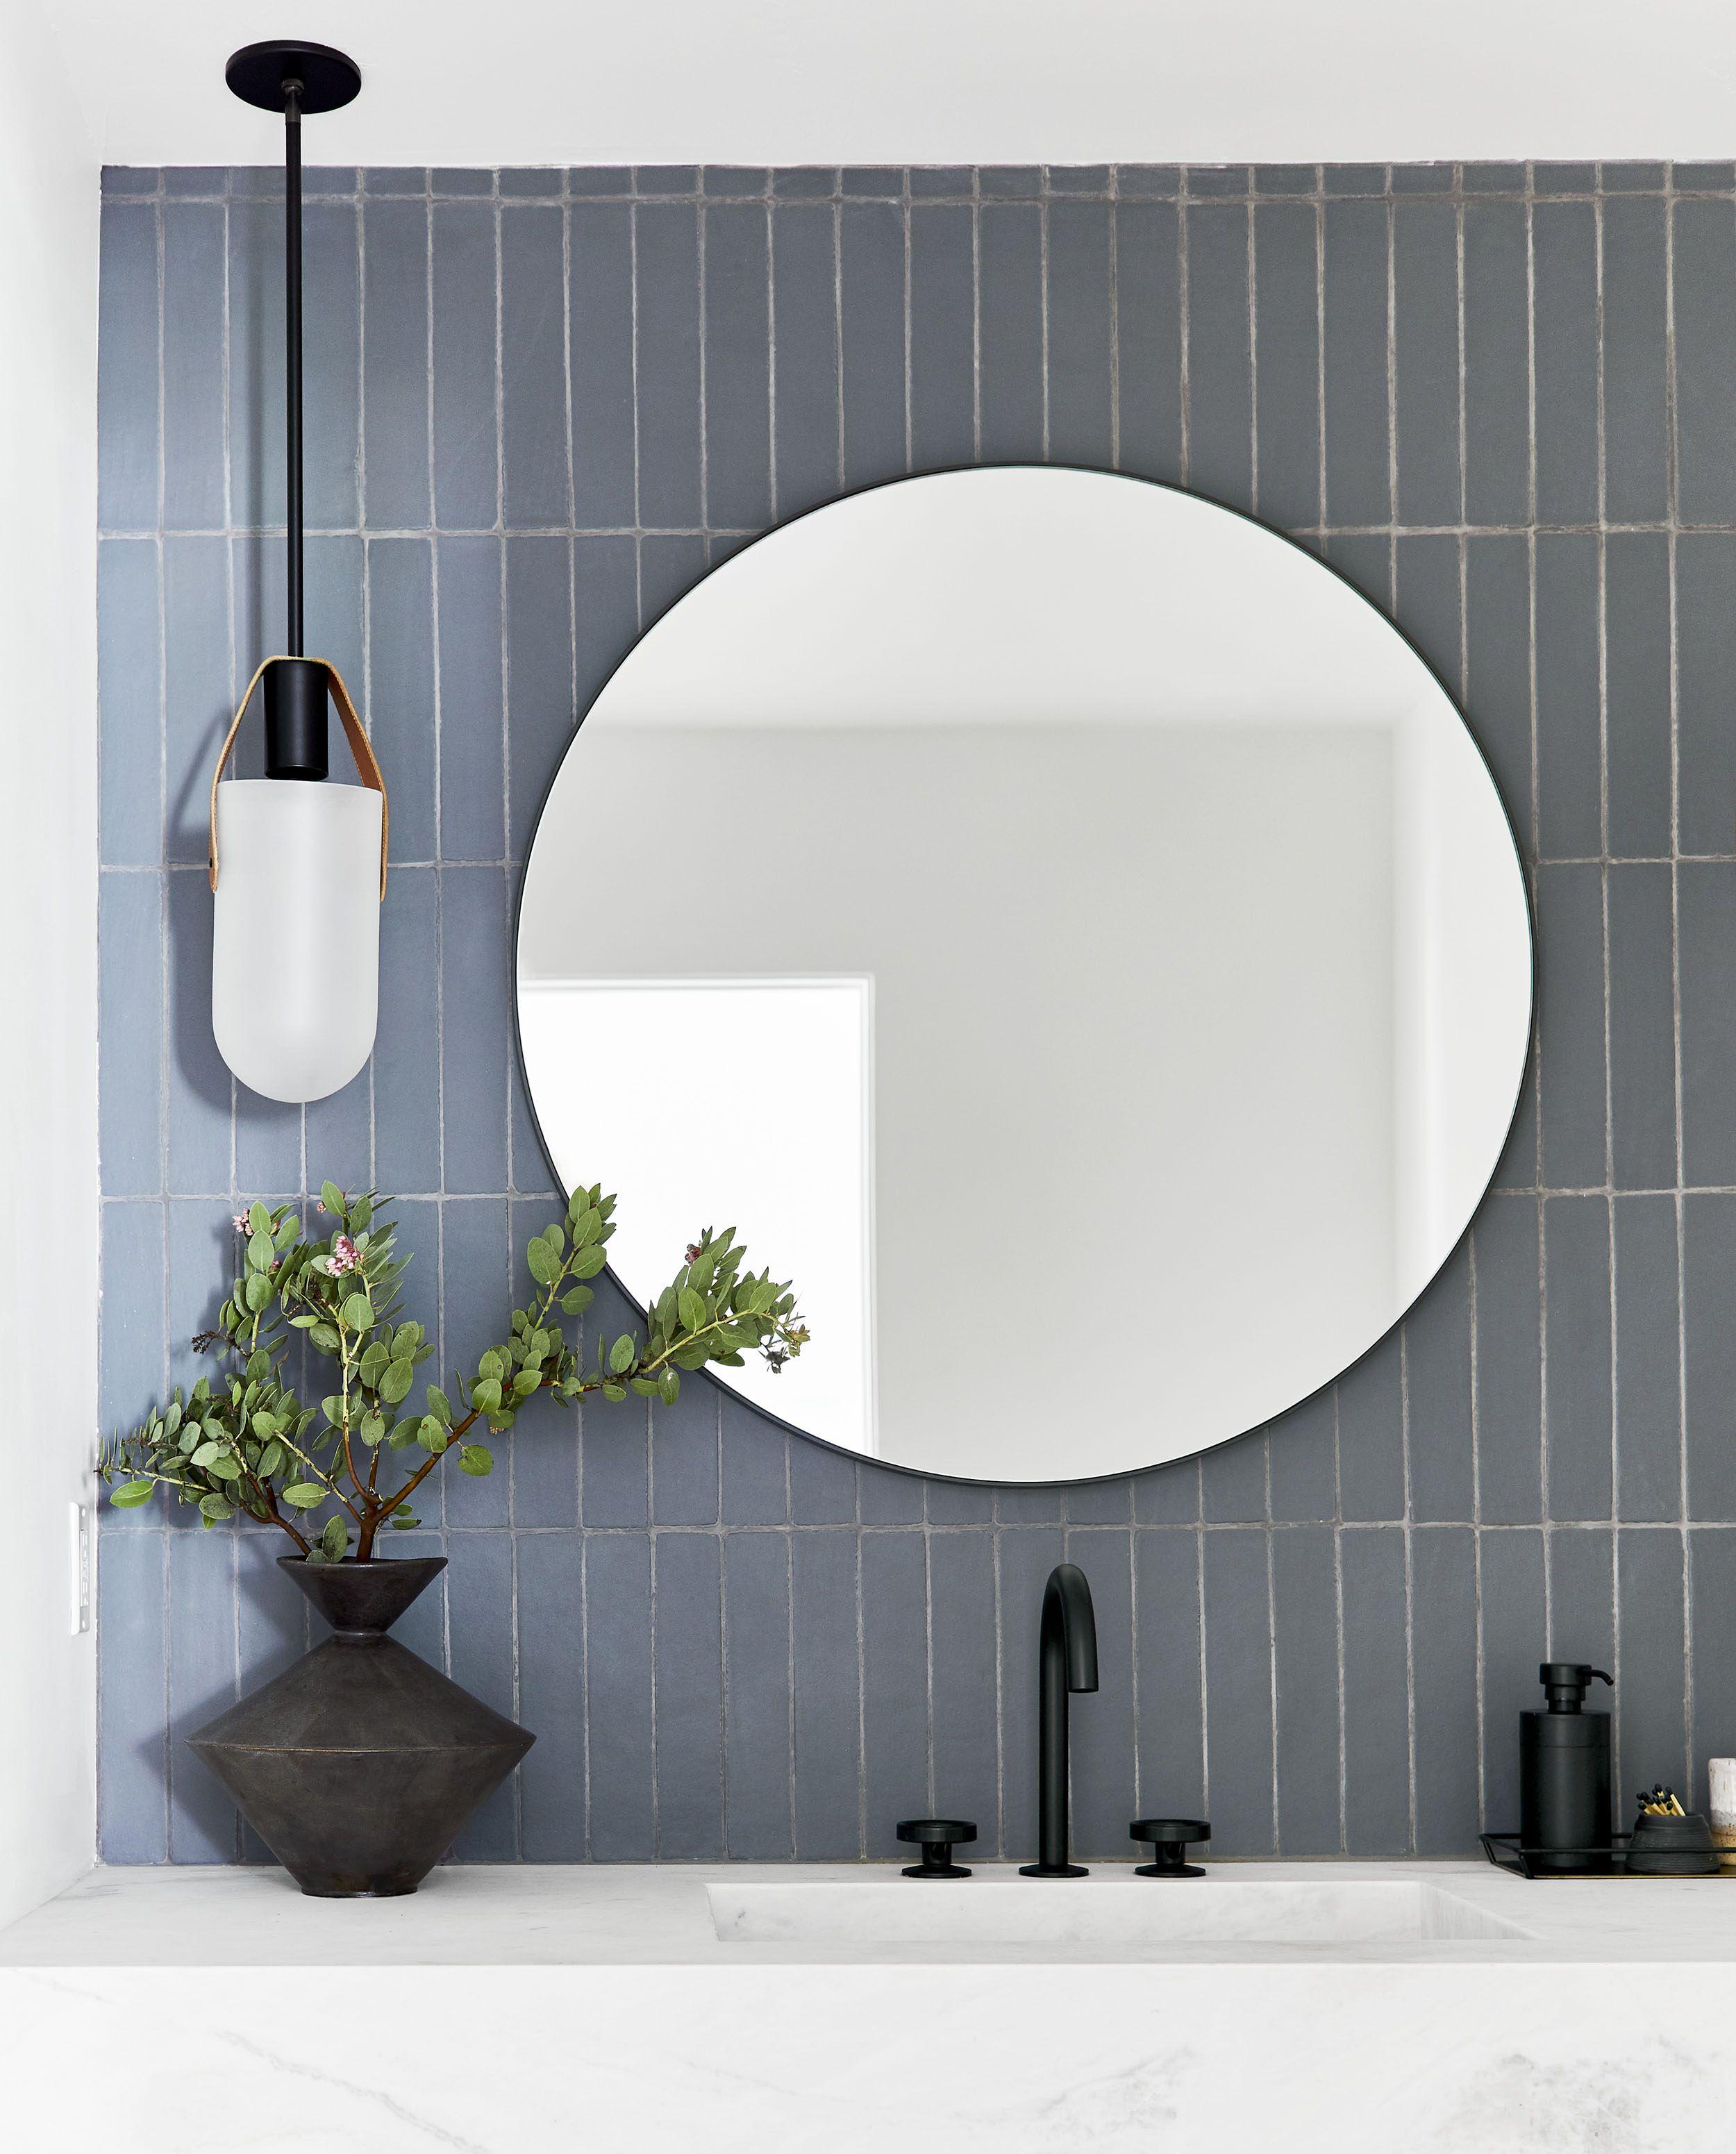 How To Design A Modern Dramatic Powder Room Bathroom Design Bathroom Backsplash Bathroom Decor